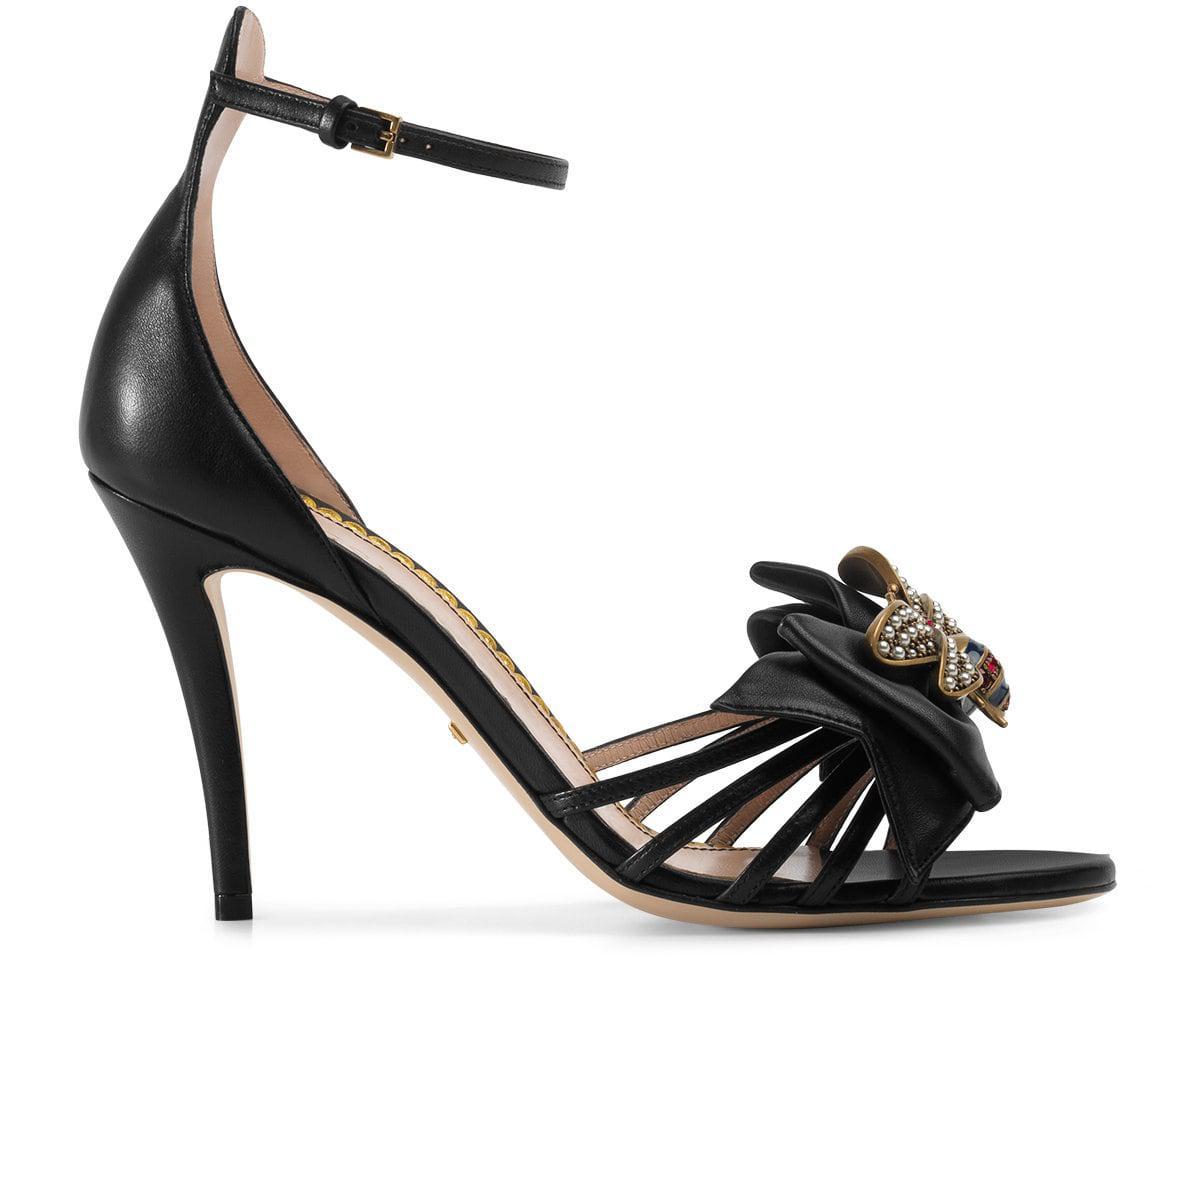 beceba060952 Gucci Embellished Leather Ankle-strap Sandals in Black - Save 26% - Lyst